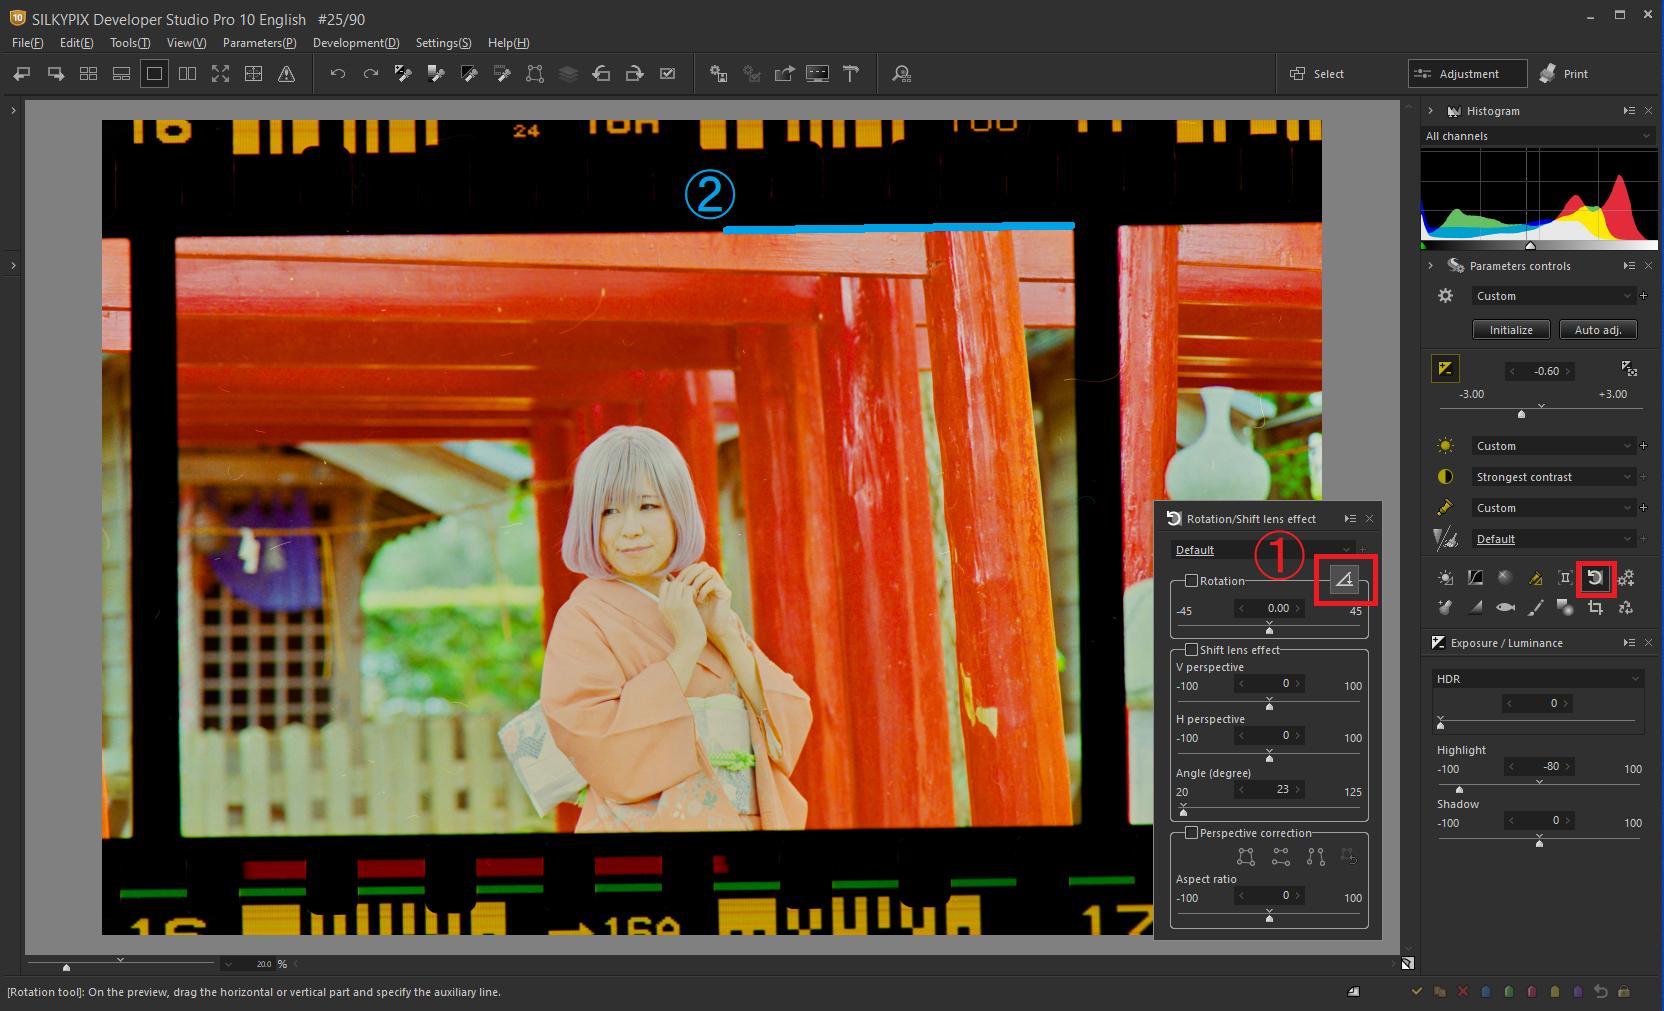 Rotation/Shift lens effect